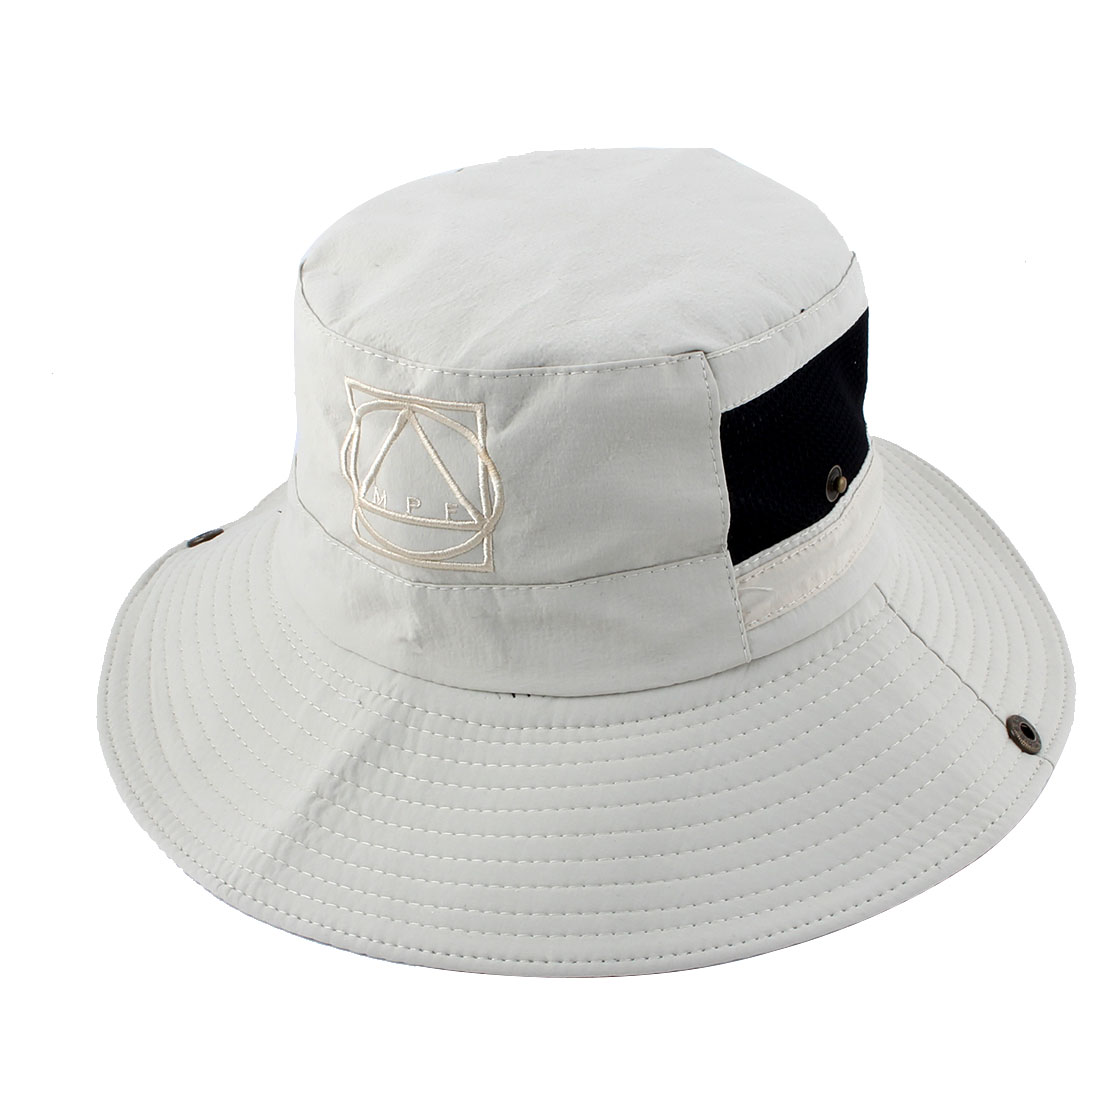 Fisherman Outdoor Hunting Fishing Bucket Polyester Geometric Pattern Mesh Brim Summer Sun Protective Cap Hat Beige